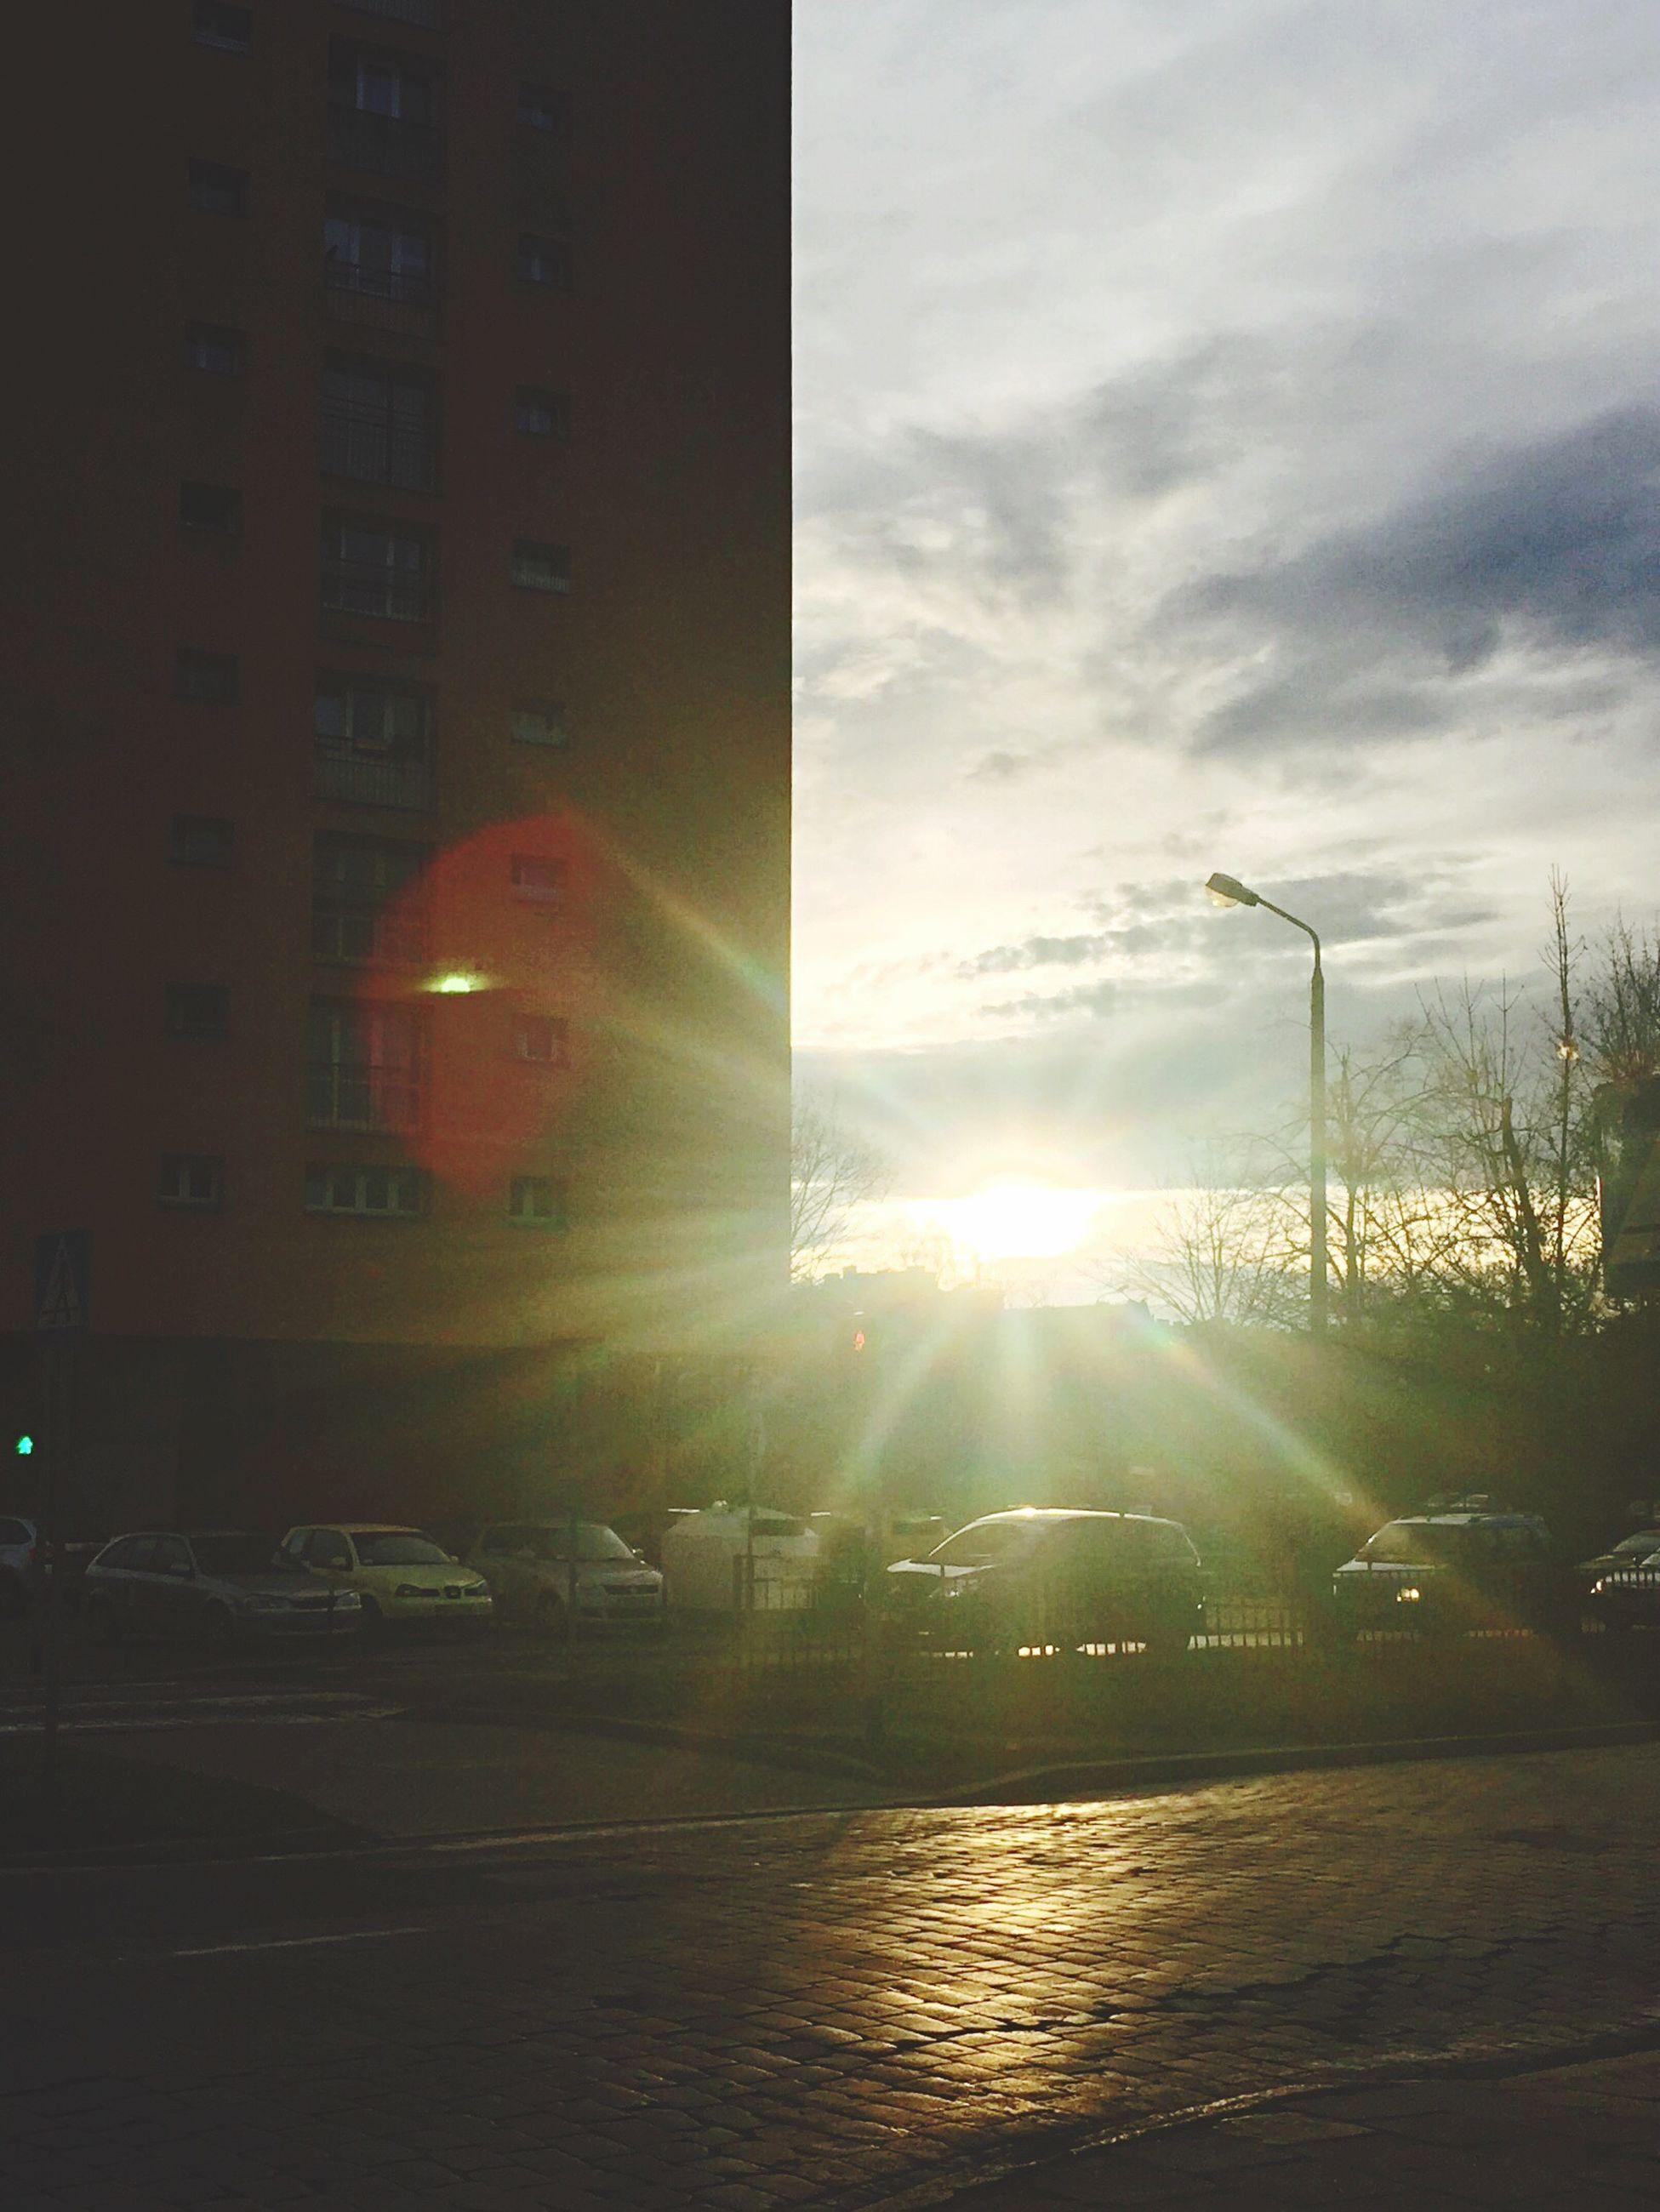 sun, transportation, building exterior, architecture, built structure, car, lens flare, sky, mode of transport, land vehicle, sunbeam, city, sunset, street, sunlight, street light, cloud - sky, road, reflection, city street